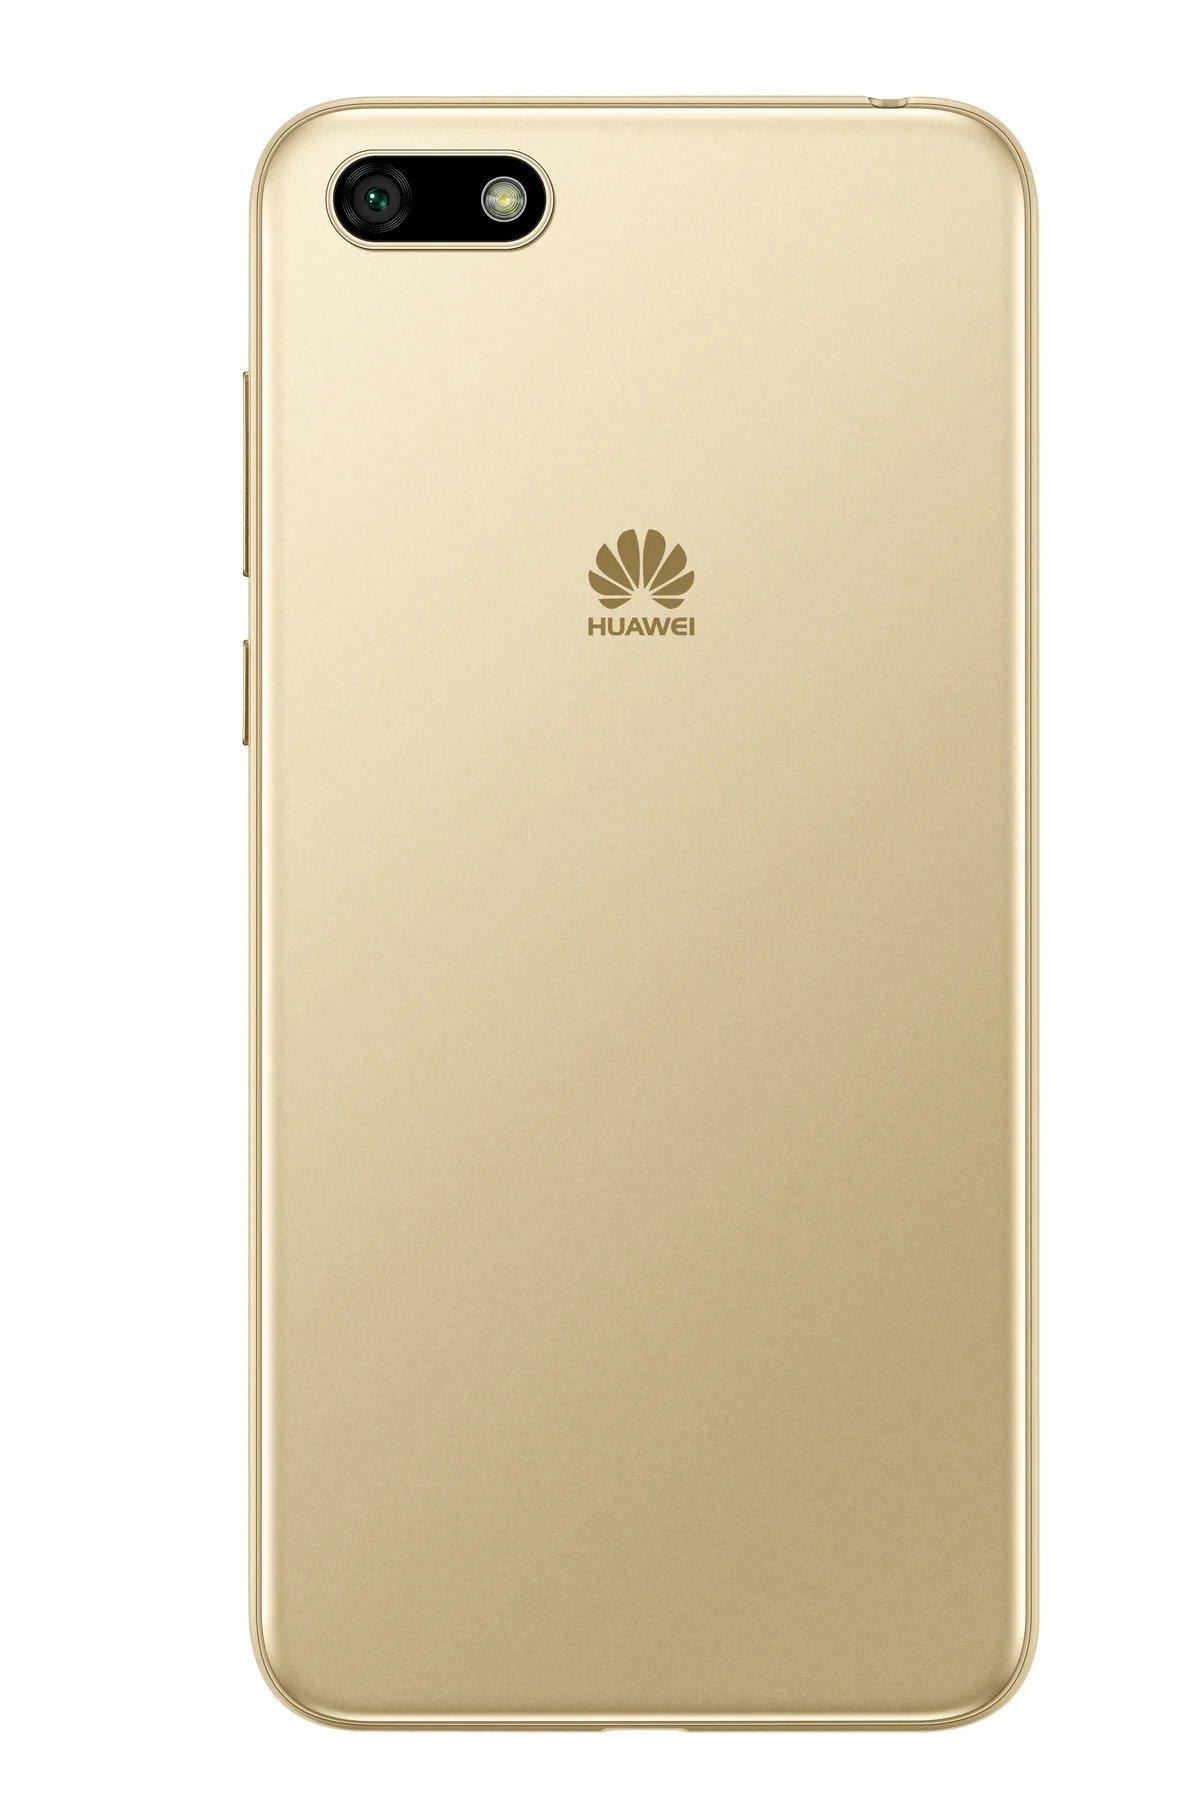 Huawei Y5Prime можно заполучить за7990 рублей